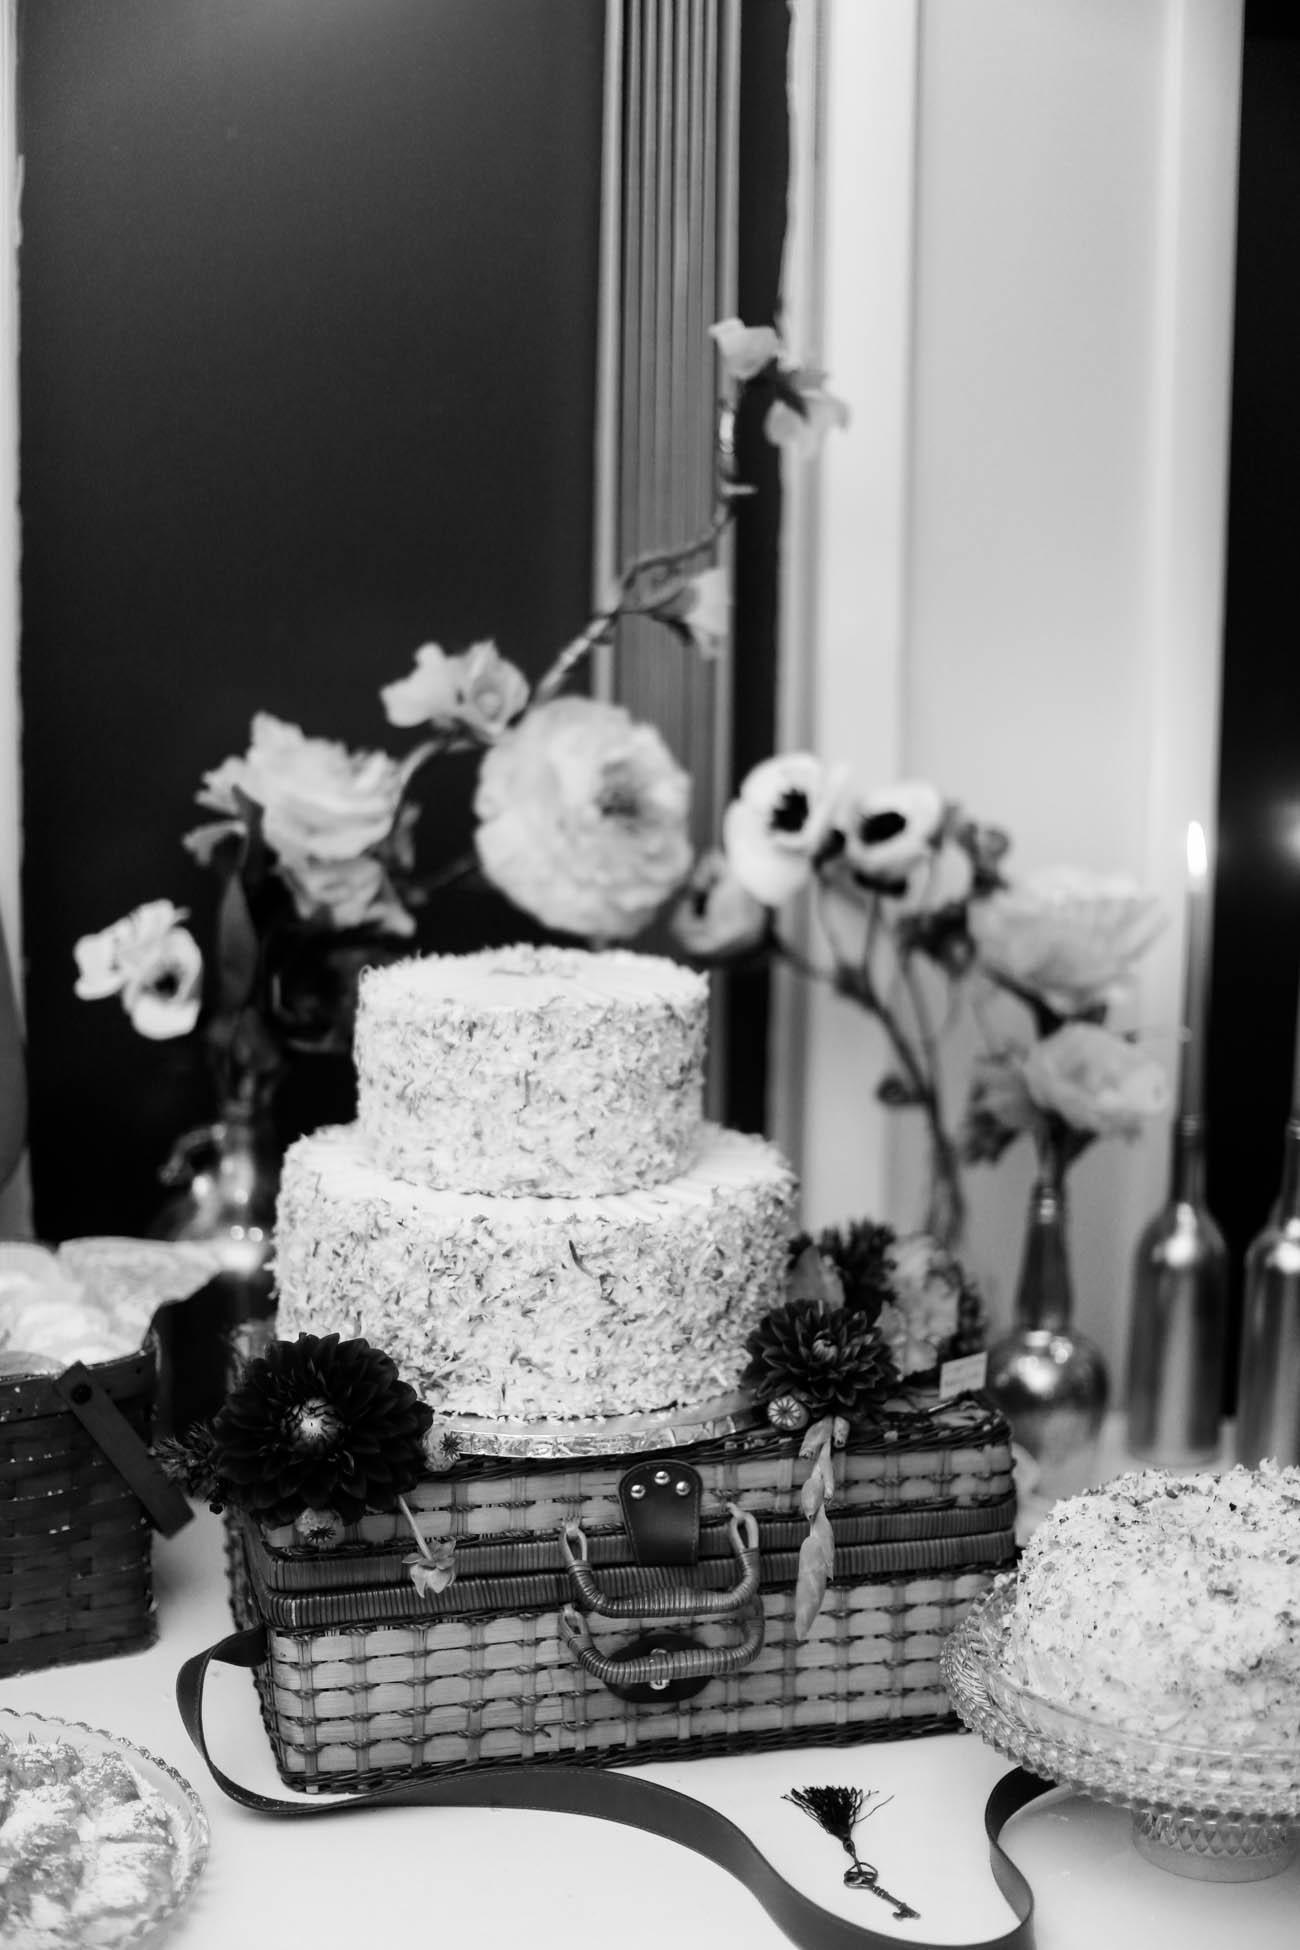 Speakeasy-1920s-theme-Louisville-and-Lexington Wedding-352.jpg